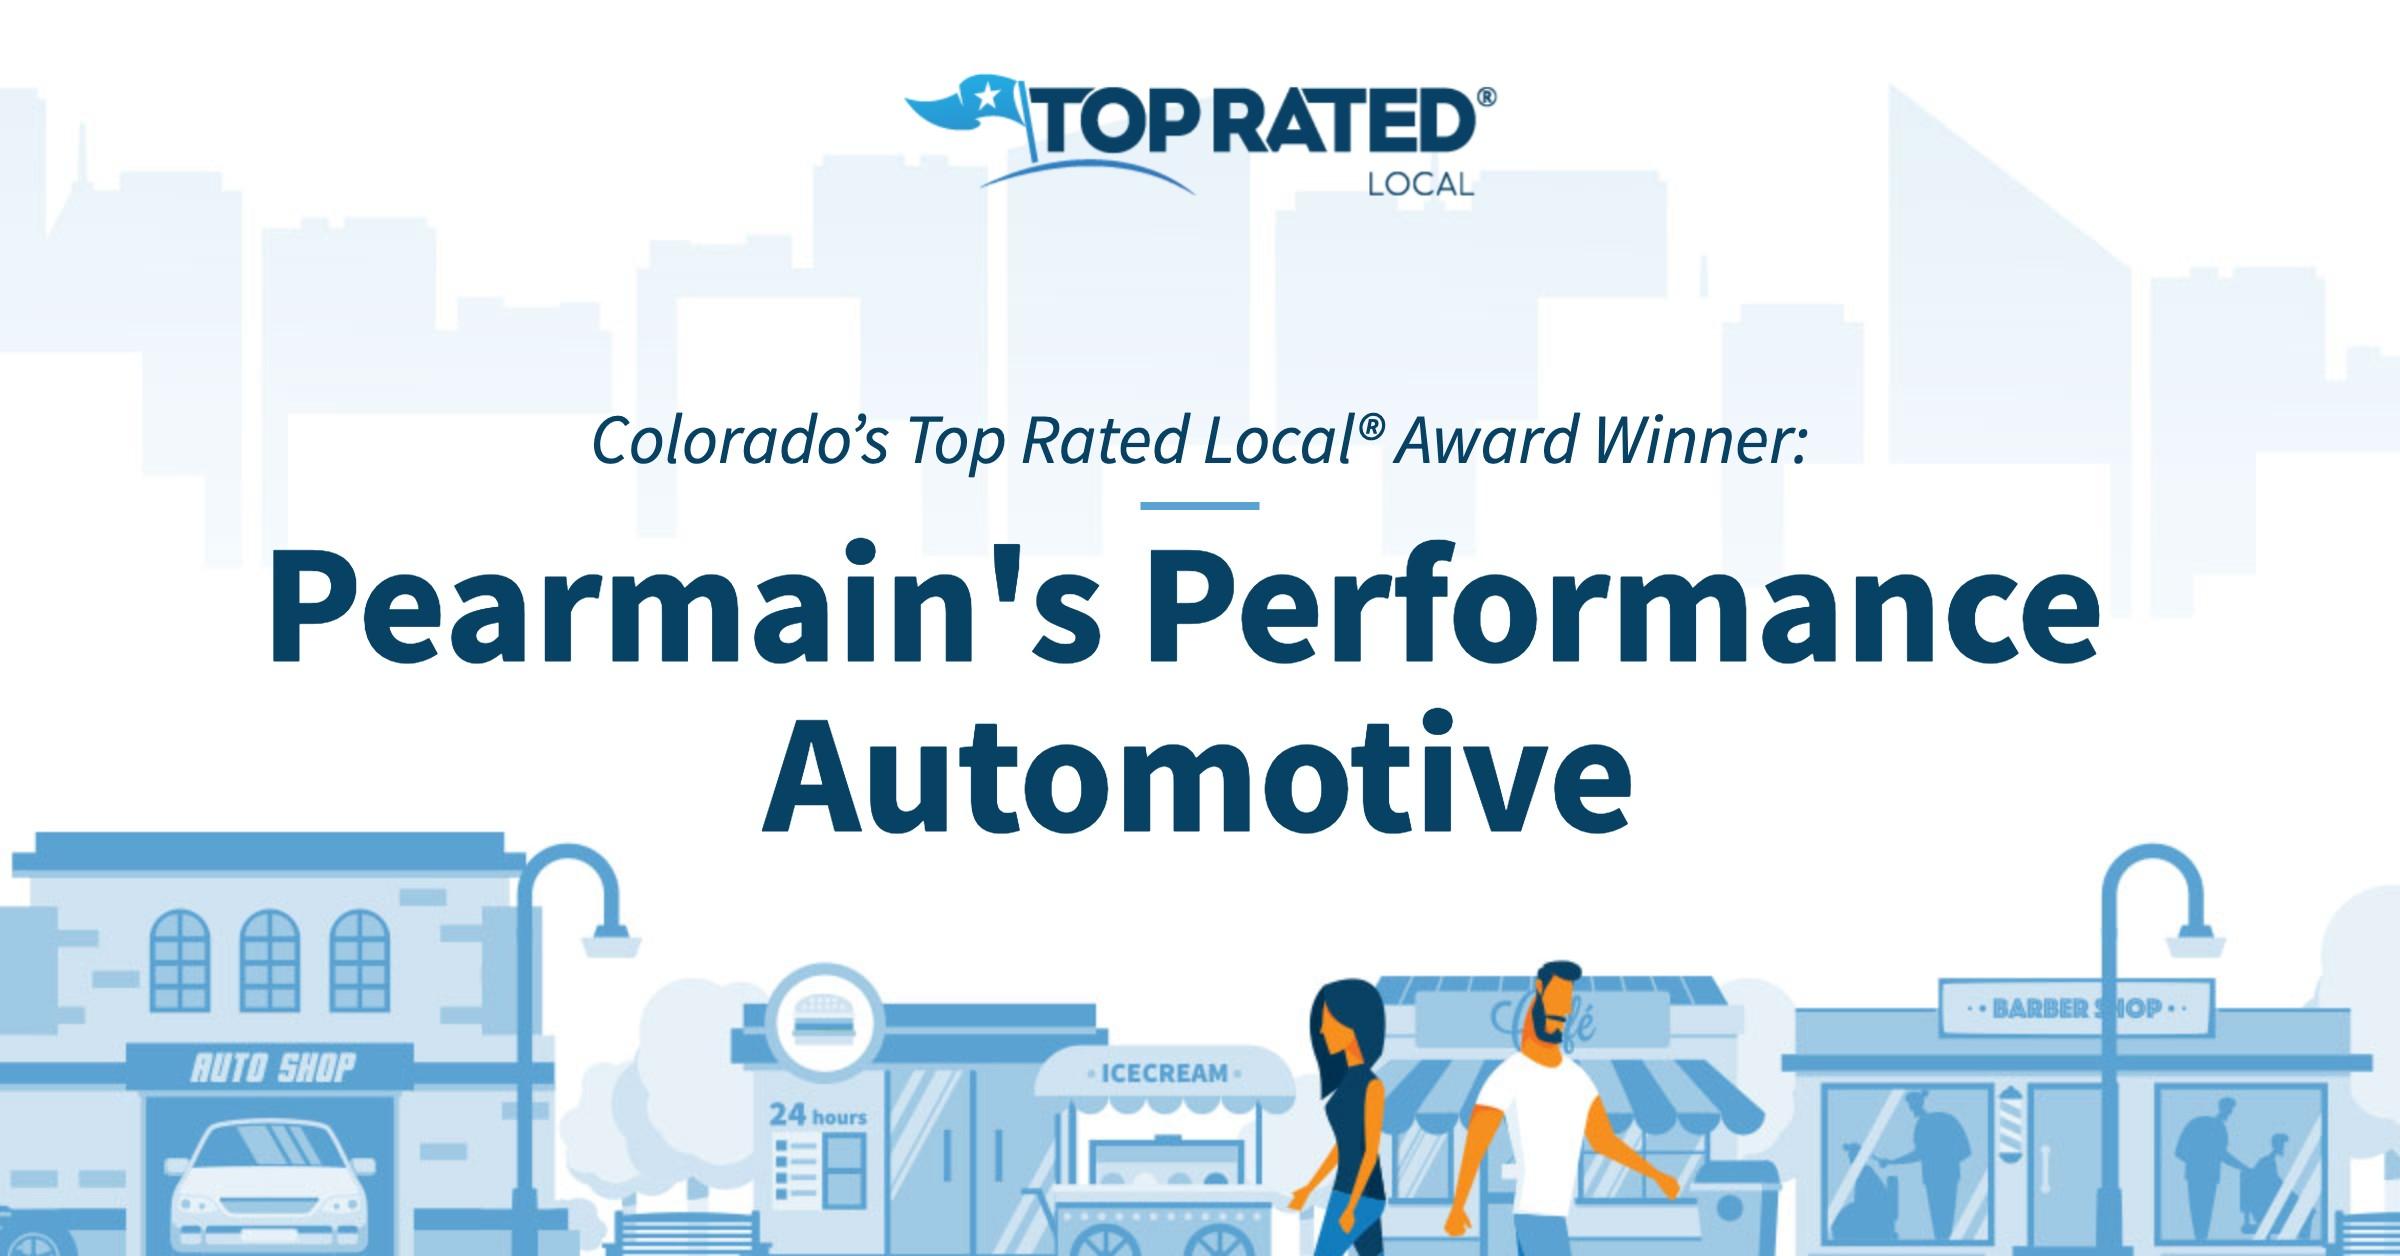 Colorado's Top Rated Local® Award Winner: Pearmain's Performance Automotive